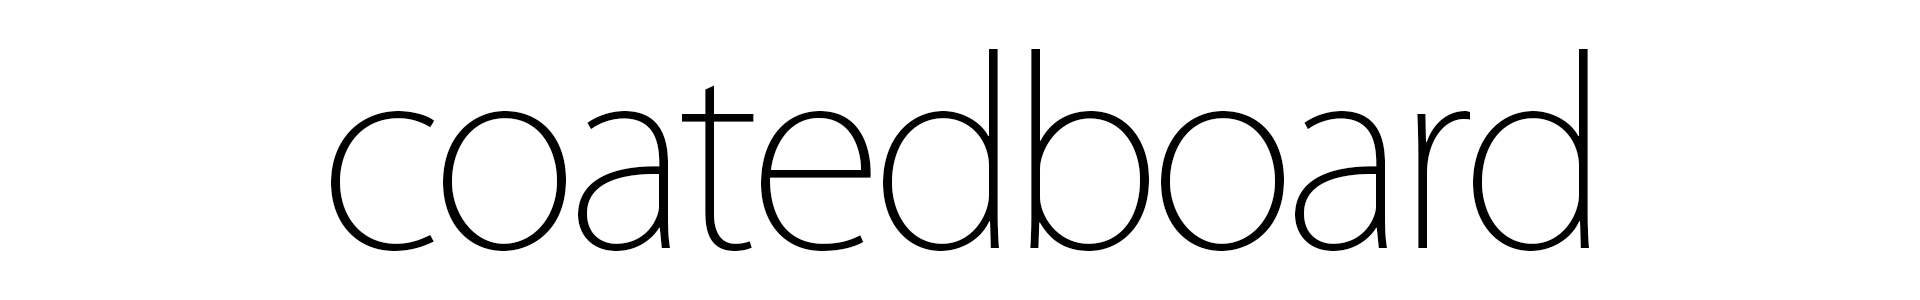 ProductSlider-Coatedbord1